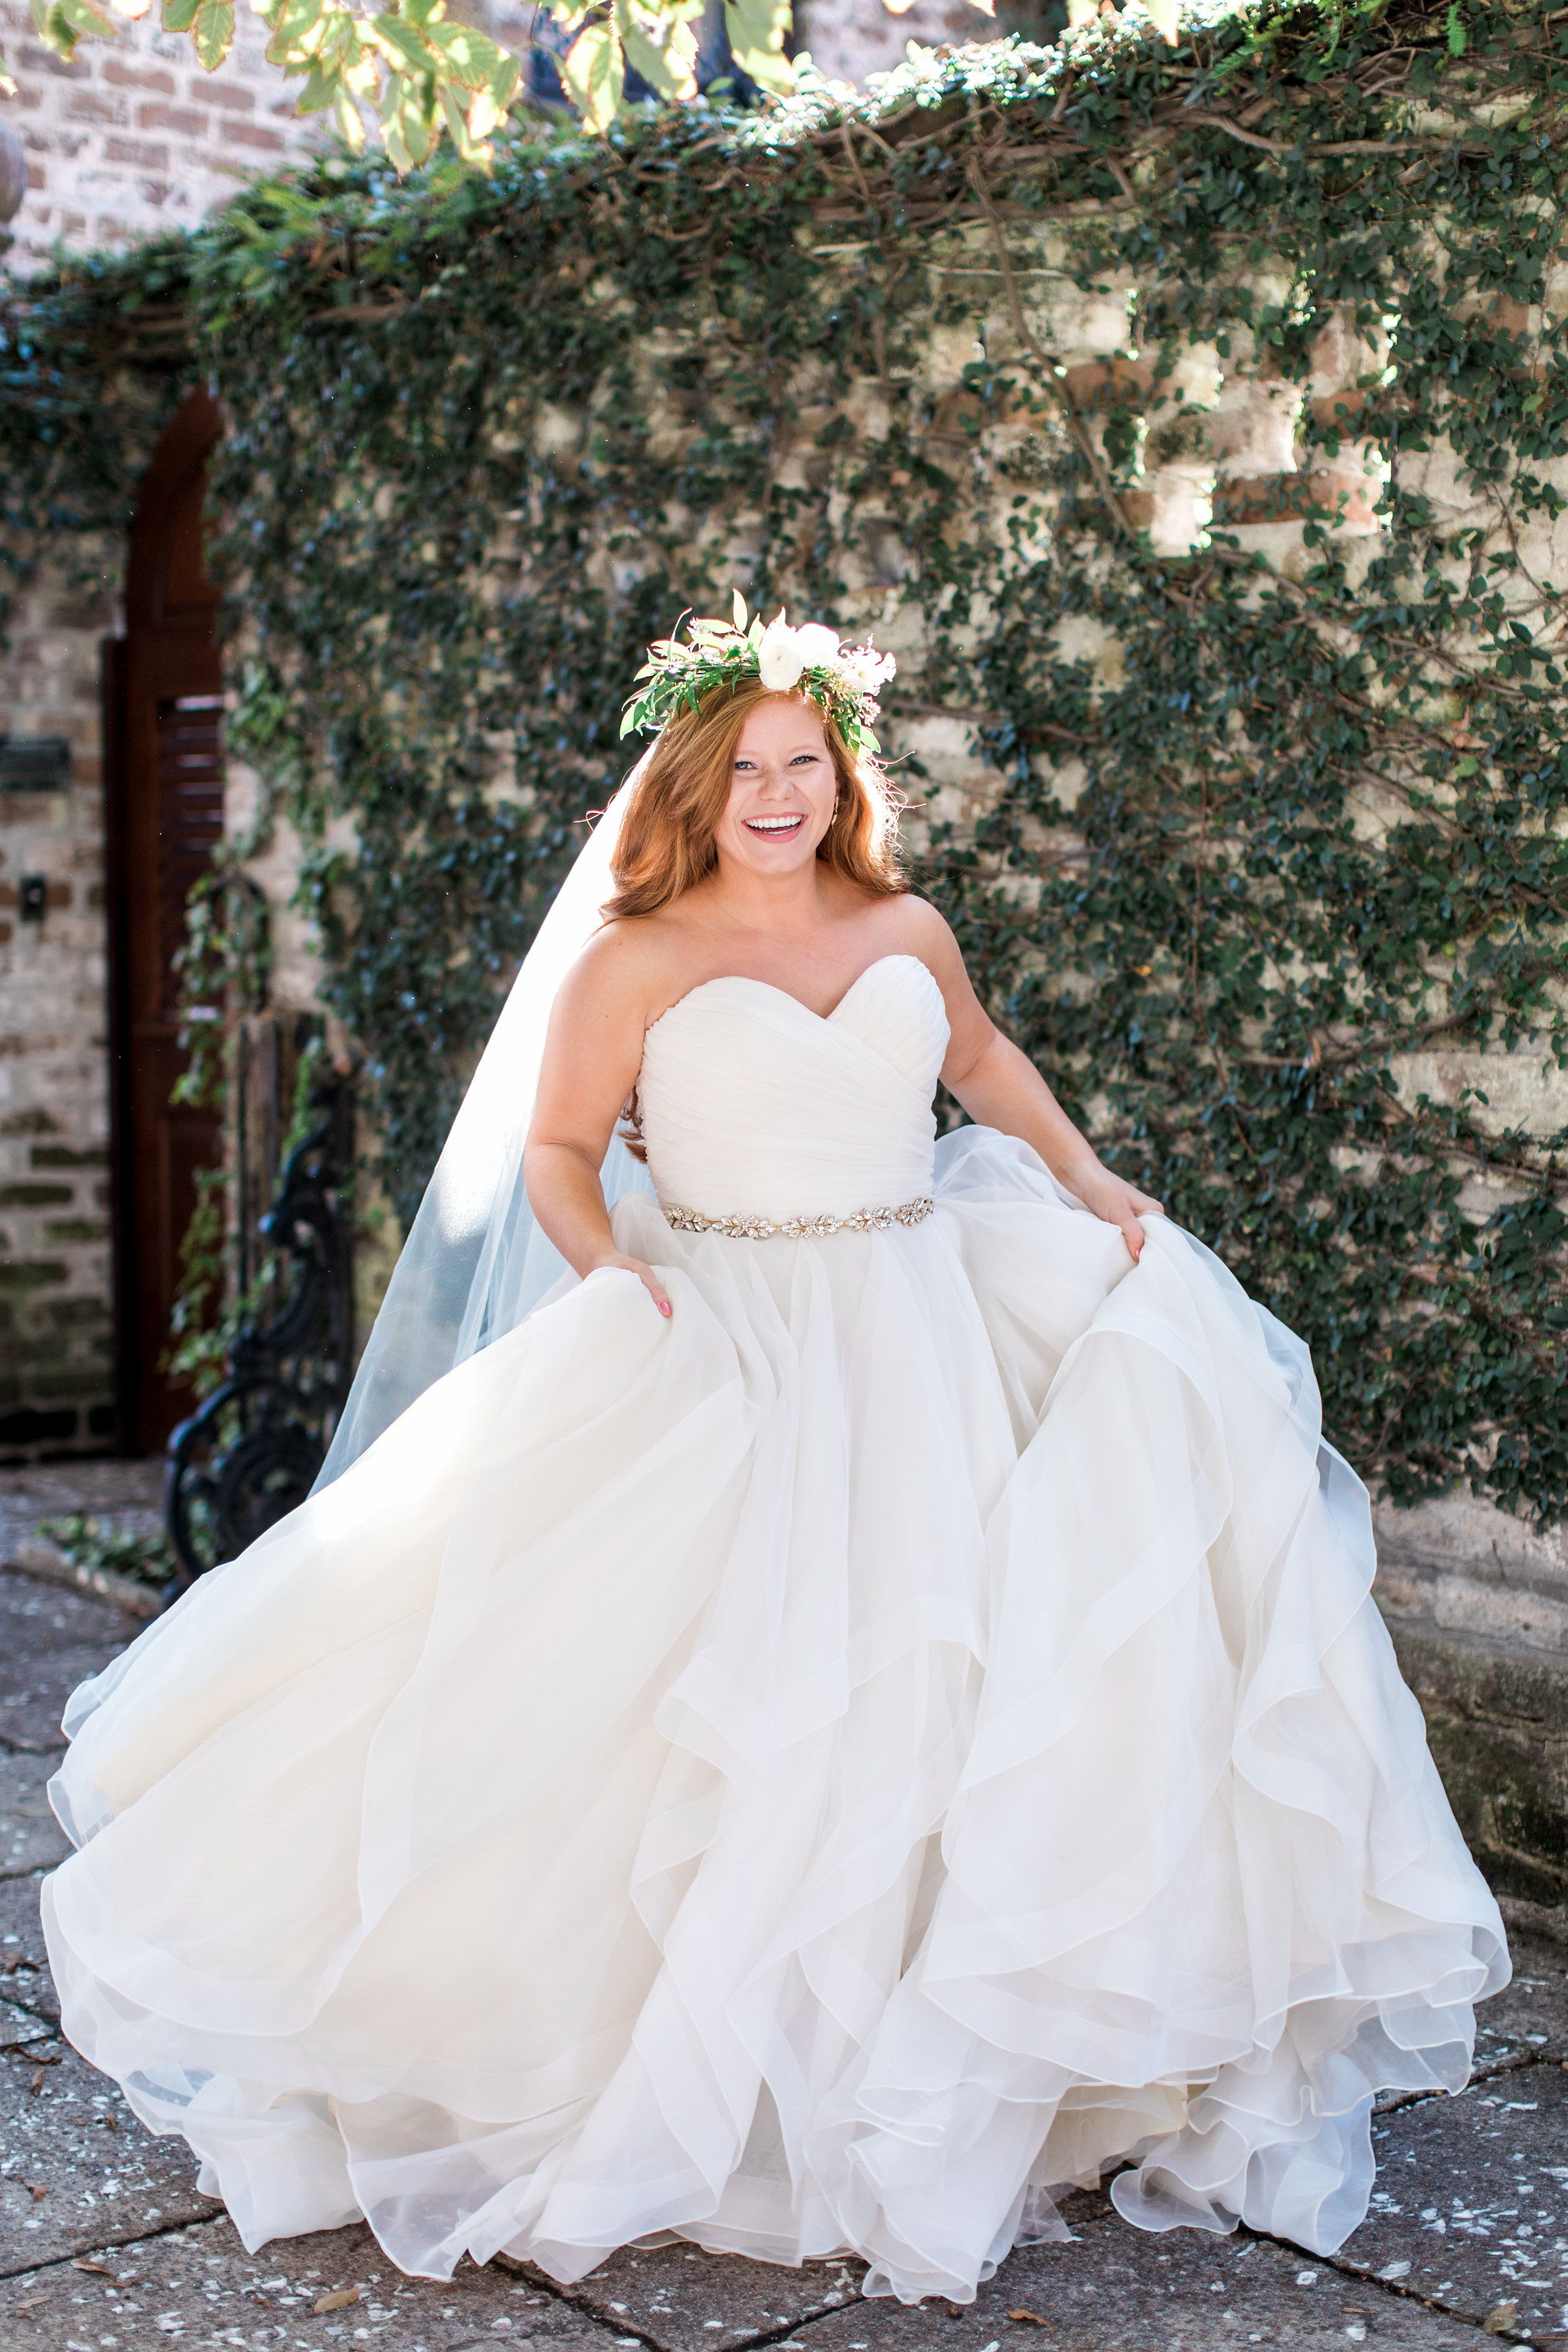 apt-b-photography-mary-elizabeths-bridal-boutique-adele-amelia-accessories-morilee-5504-savannah-bridal-boutique-savannah-weddings-savannah-wedding-photographer-savannah-bridal-gowns-savannah-wedding-dresses-historic-savannah-wedding-7.jpg